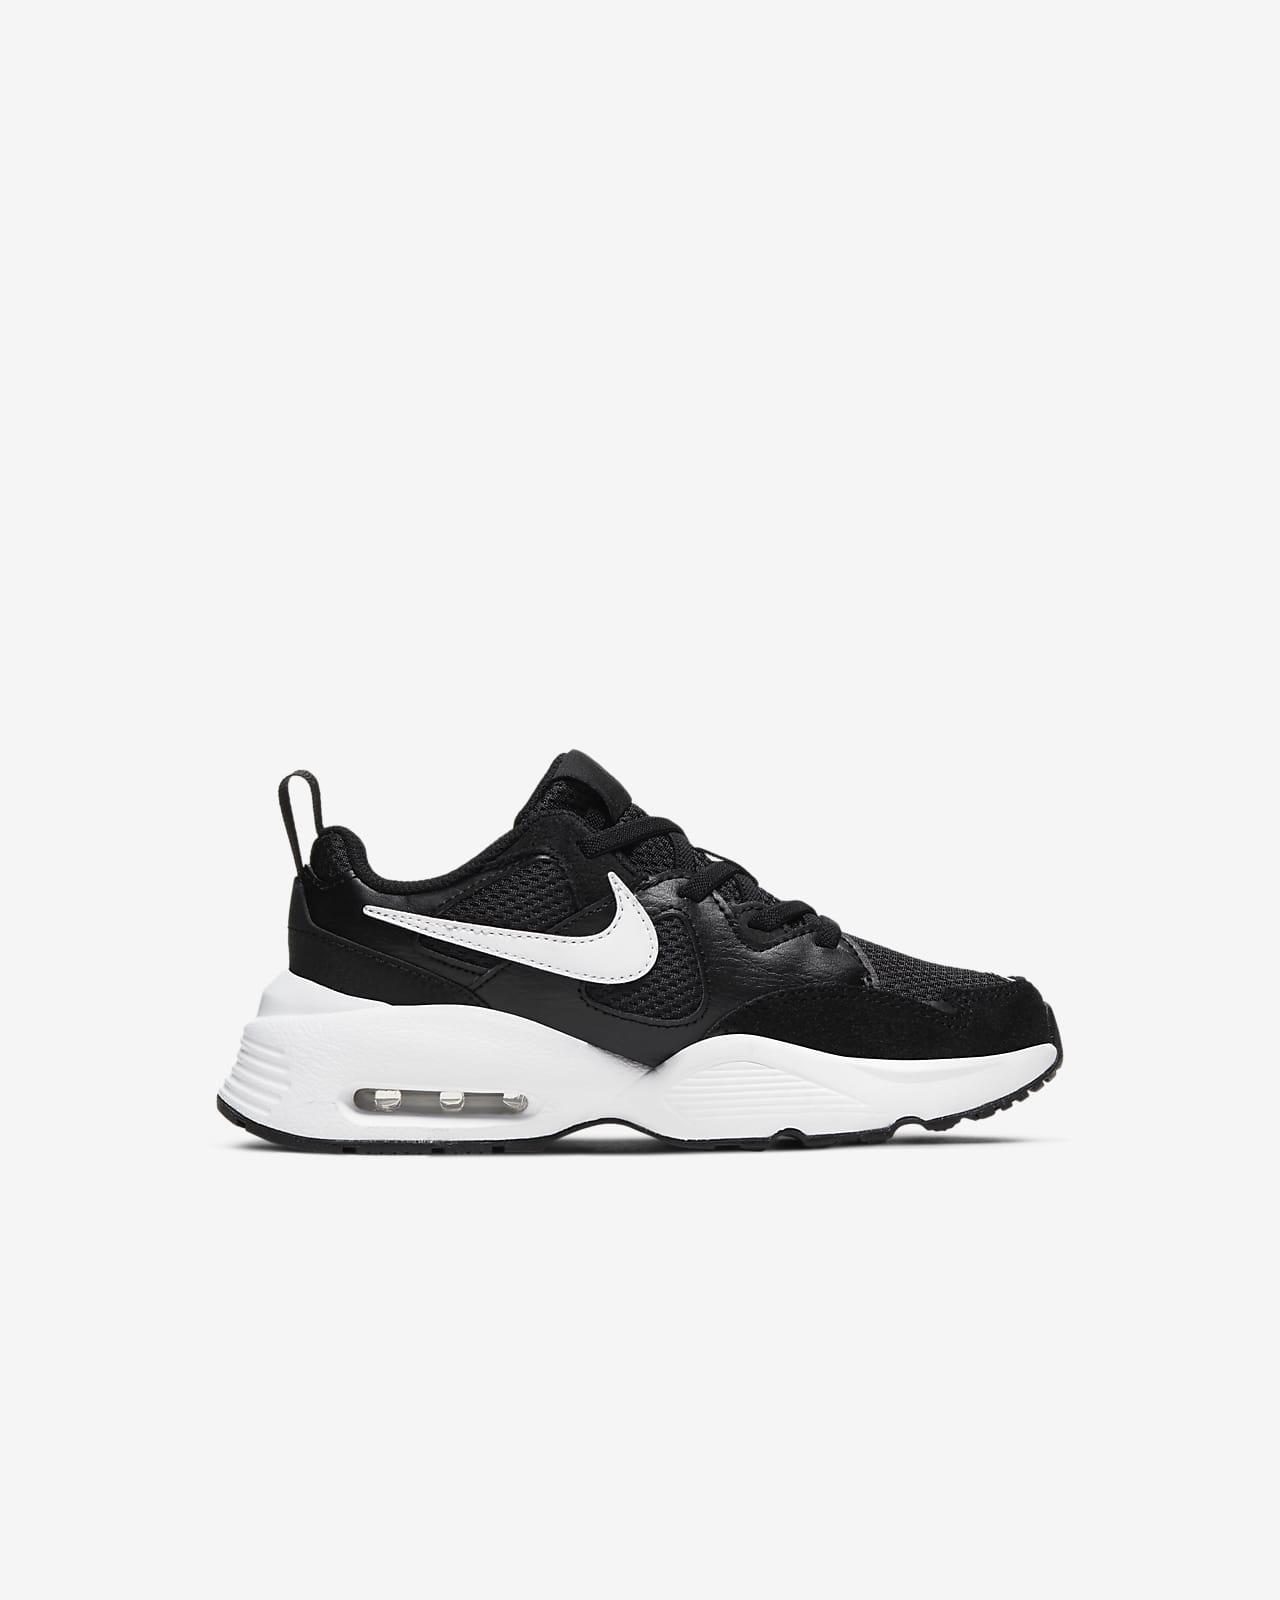 nike air max 200 zapatillas - niño/a pequeño/a